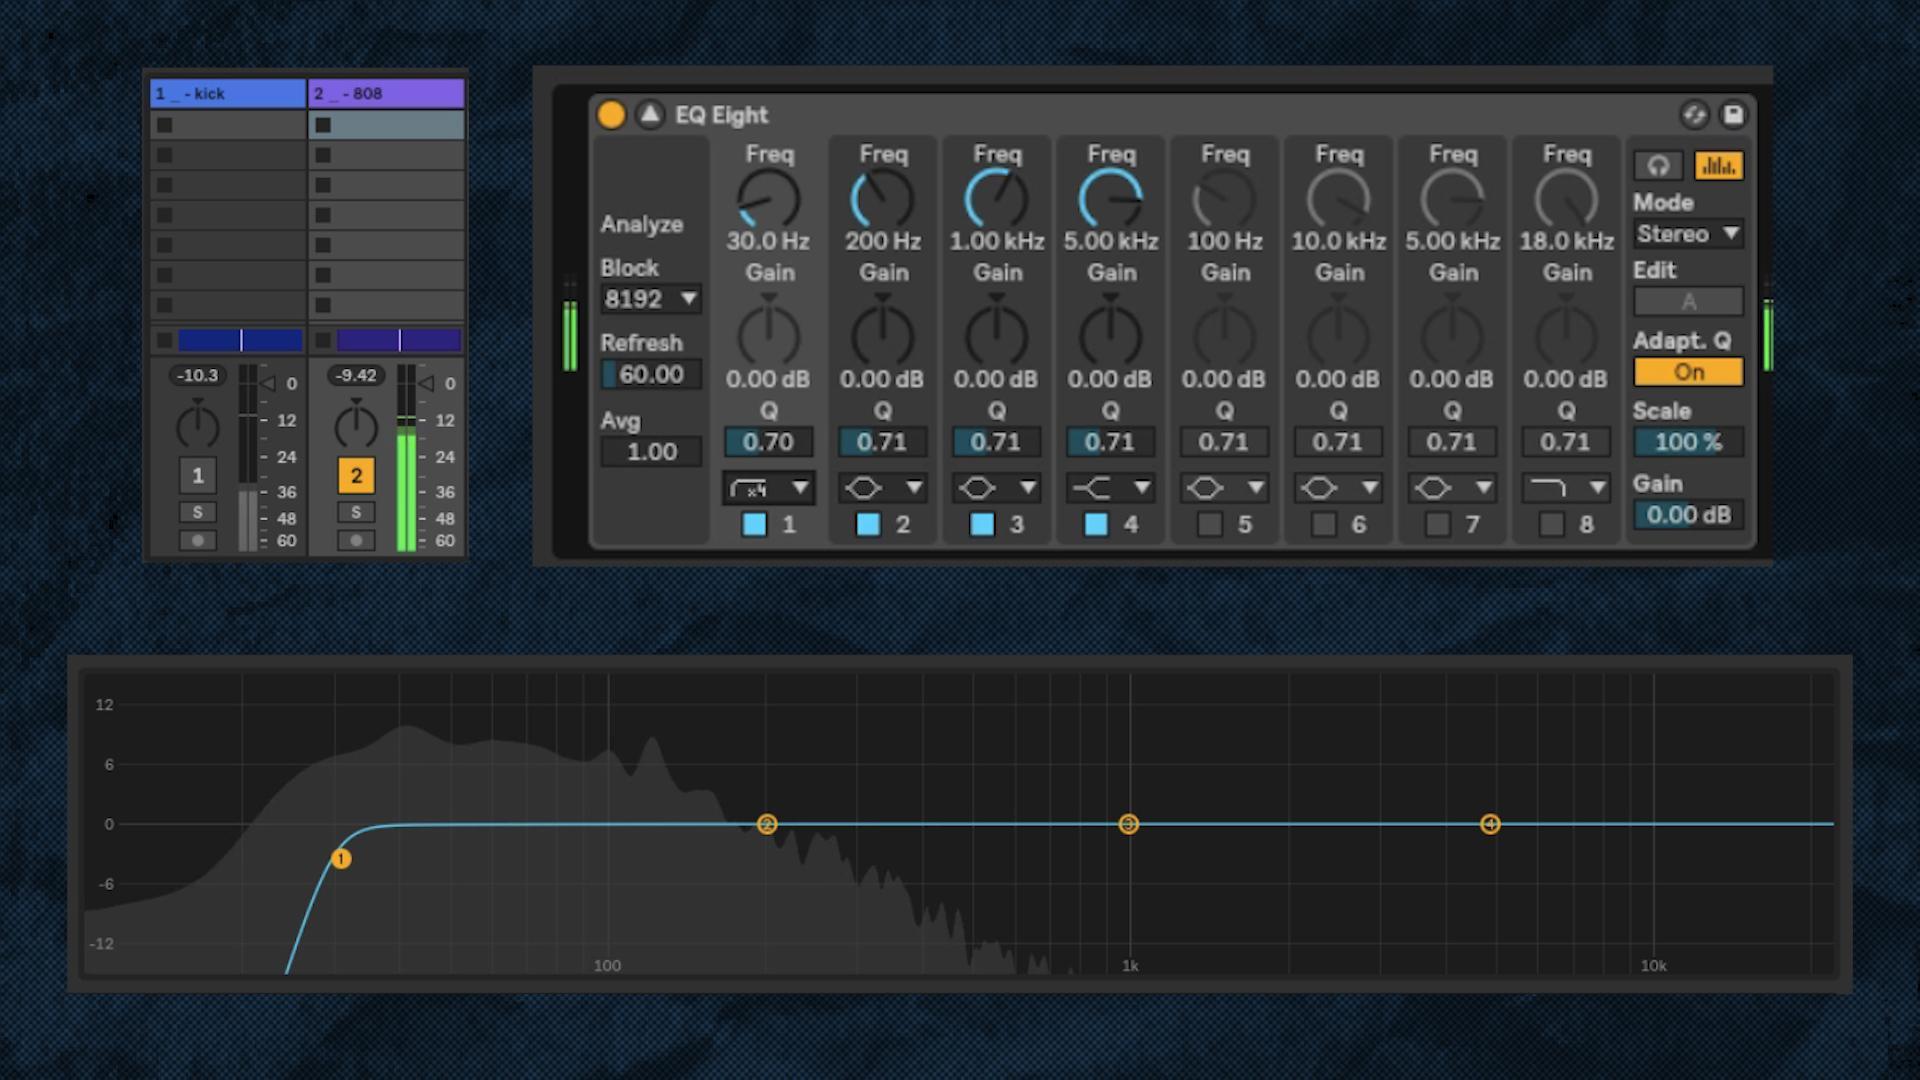 48 db/octave high-pass at 30 Hz